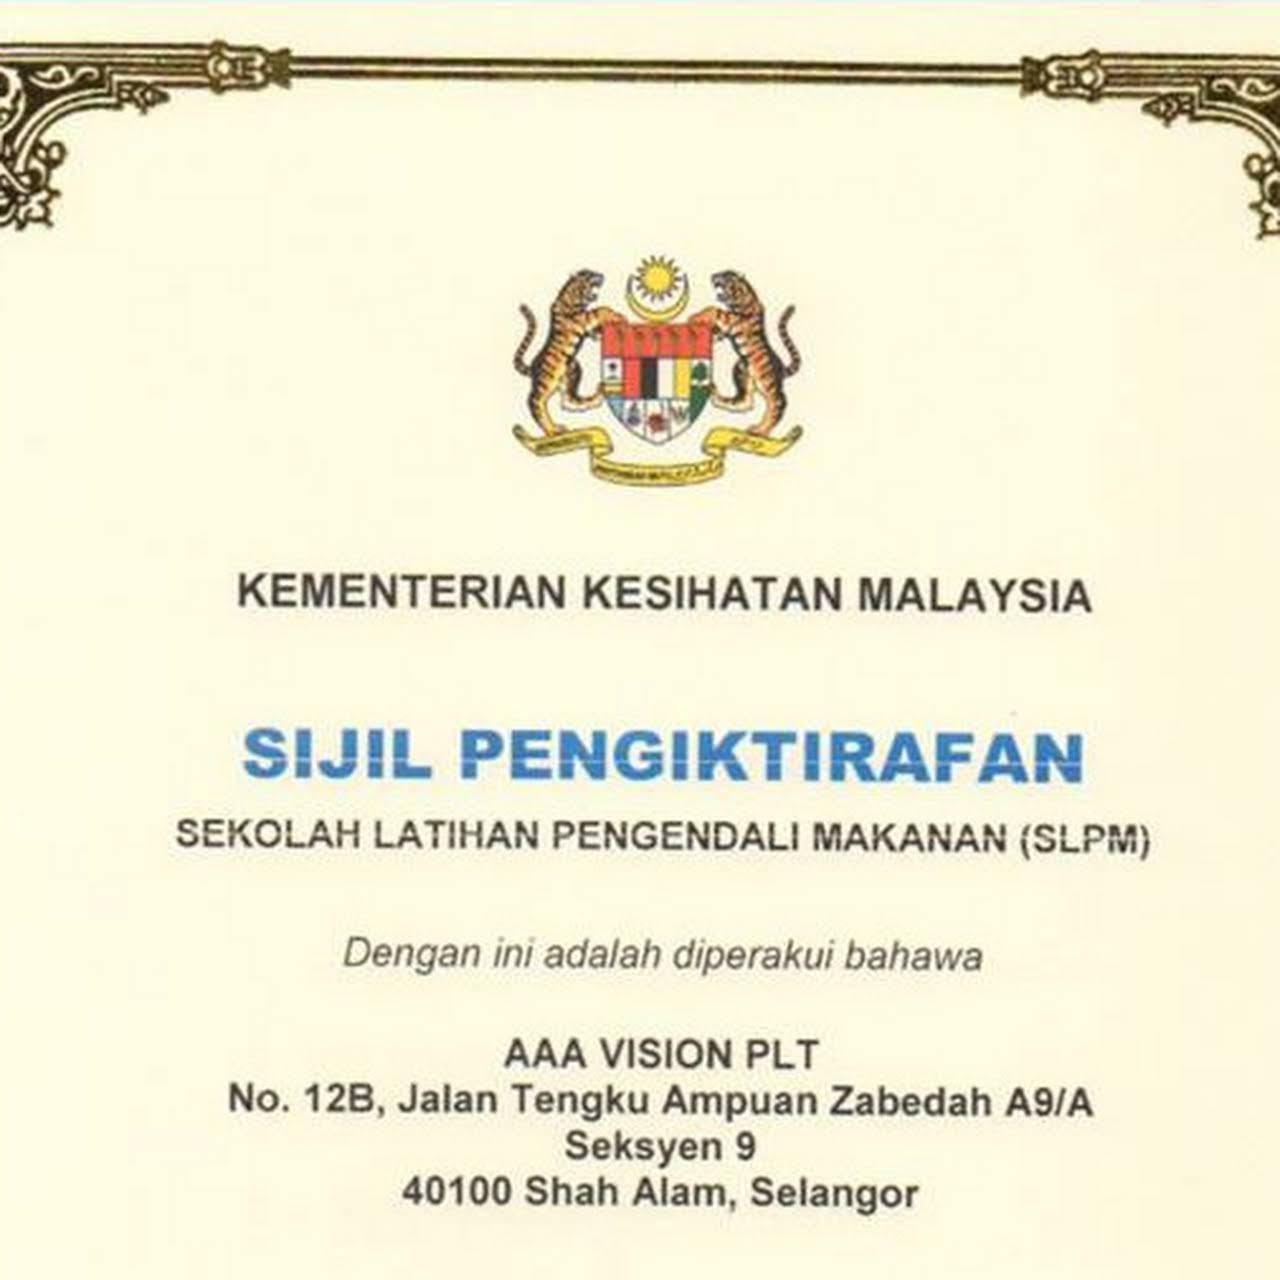 Kursus Pengendalian Makanan Klang Shah Alam Aaa Vision Academy Training Centre In Sungai Udang